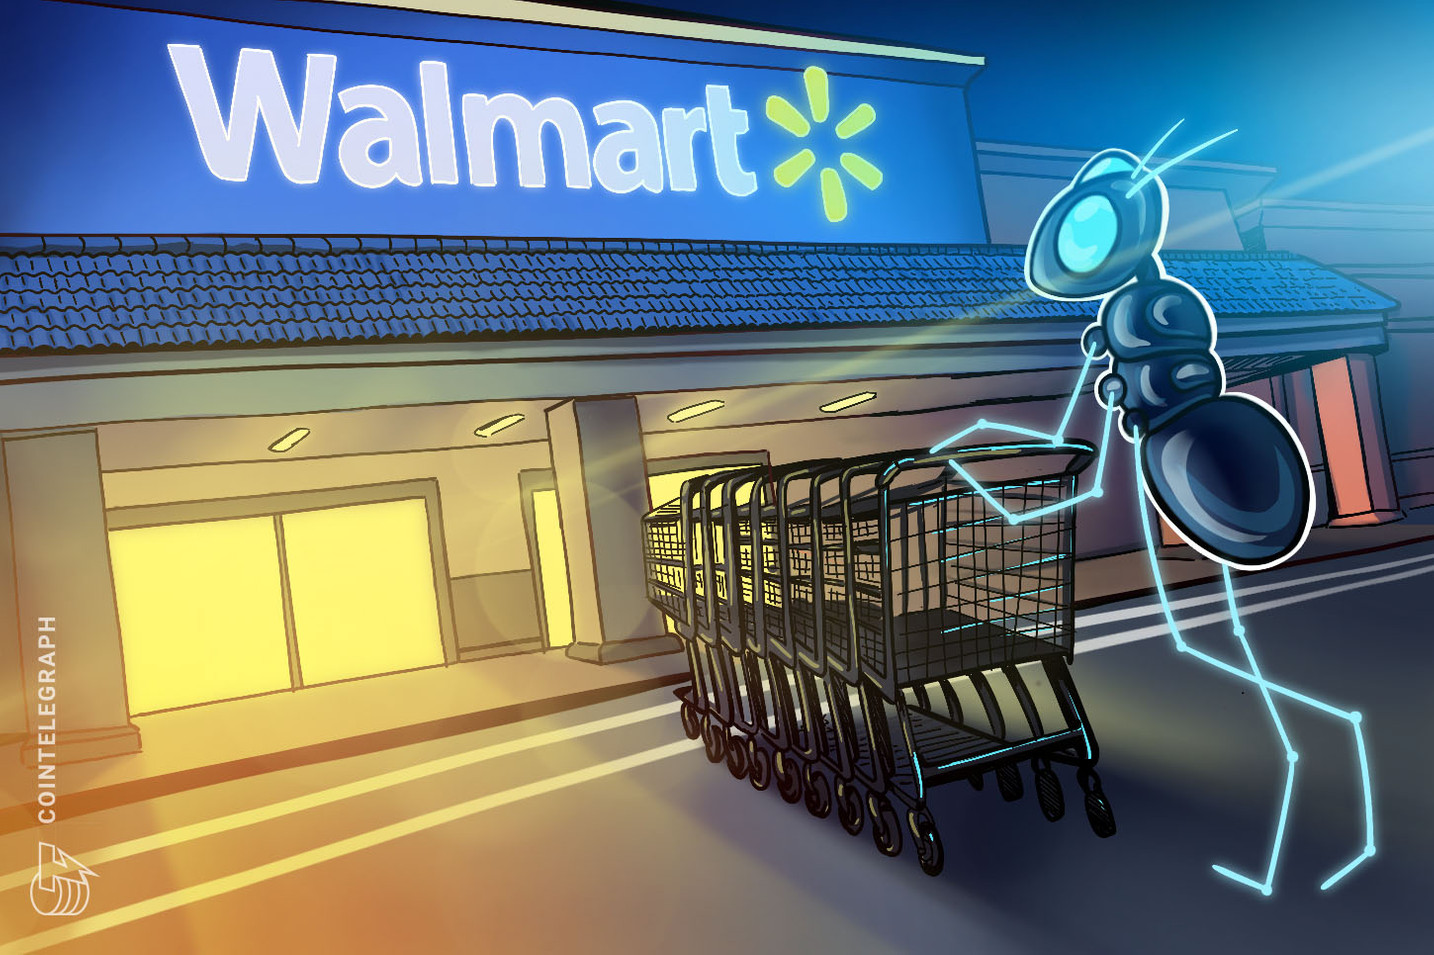 Walmart se une a Hyperledger junto con otras 7 empresas